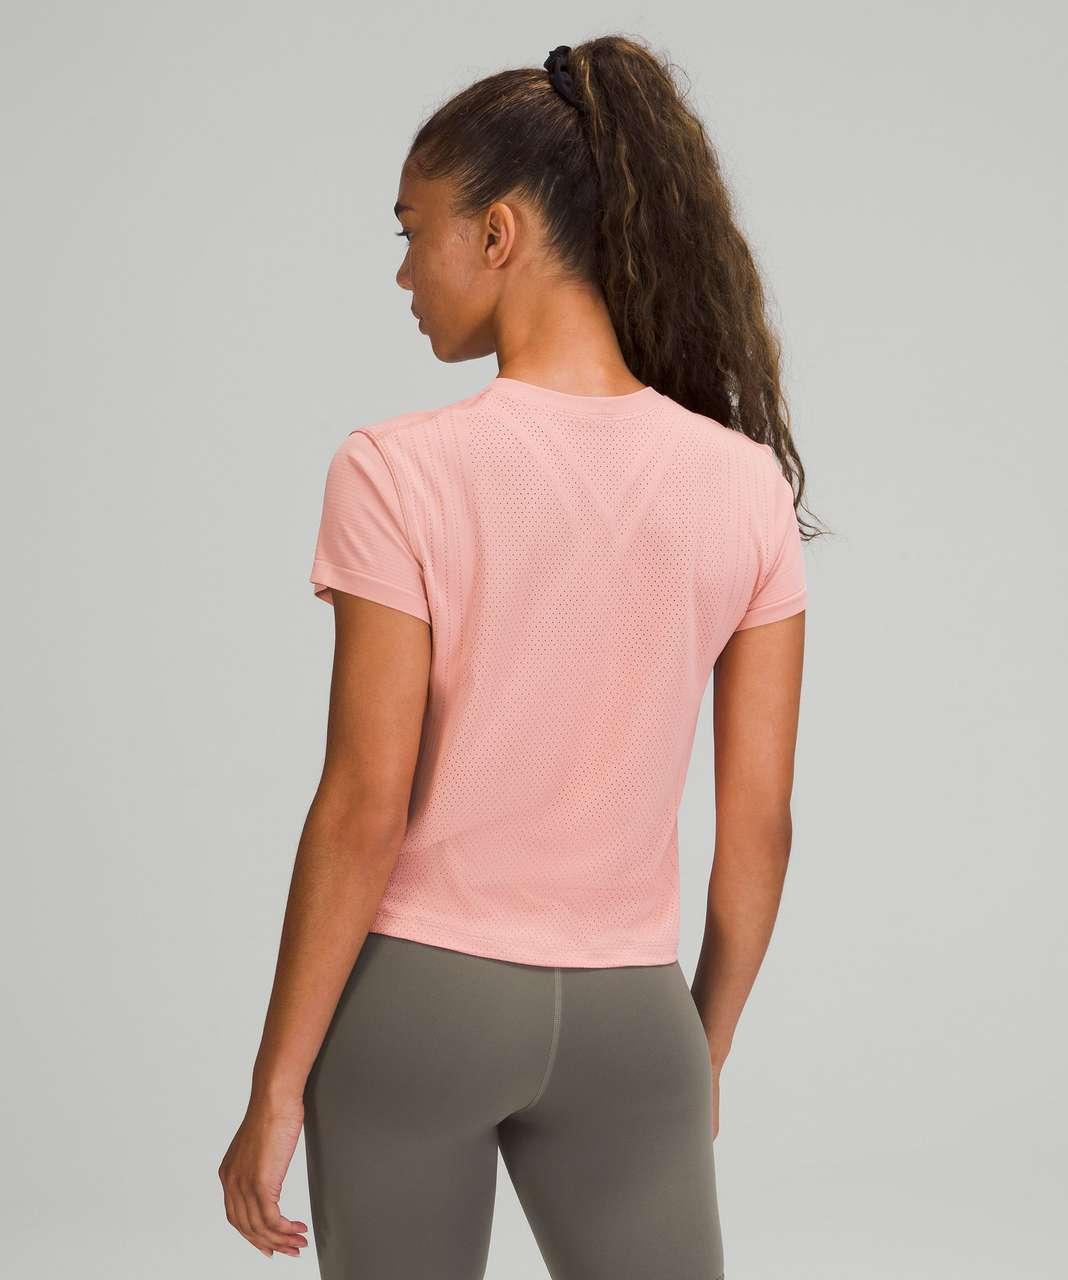 Lululemon Train to Be Short Sleeve Shirt - Pink Puff / Pink Puff